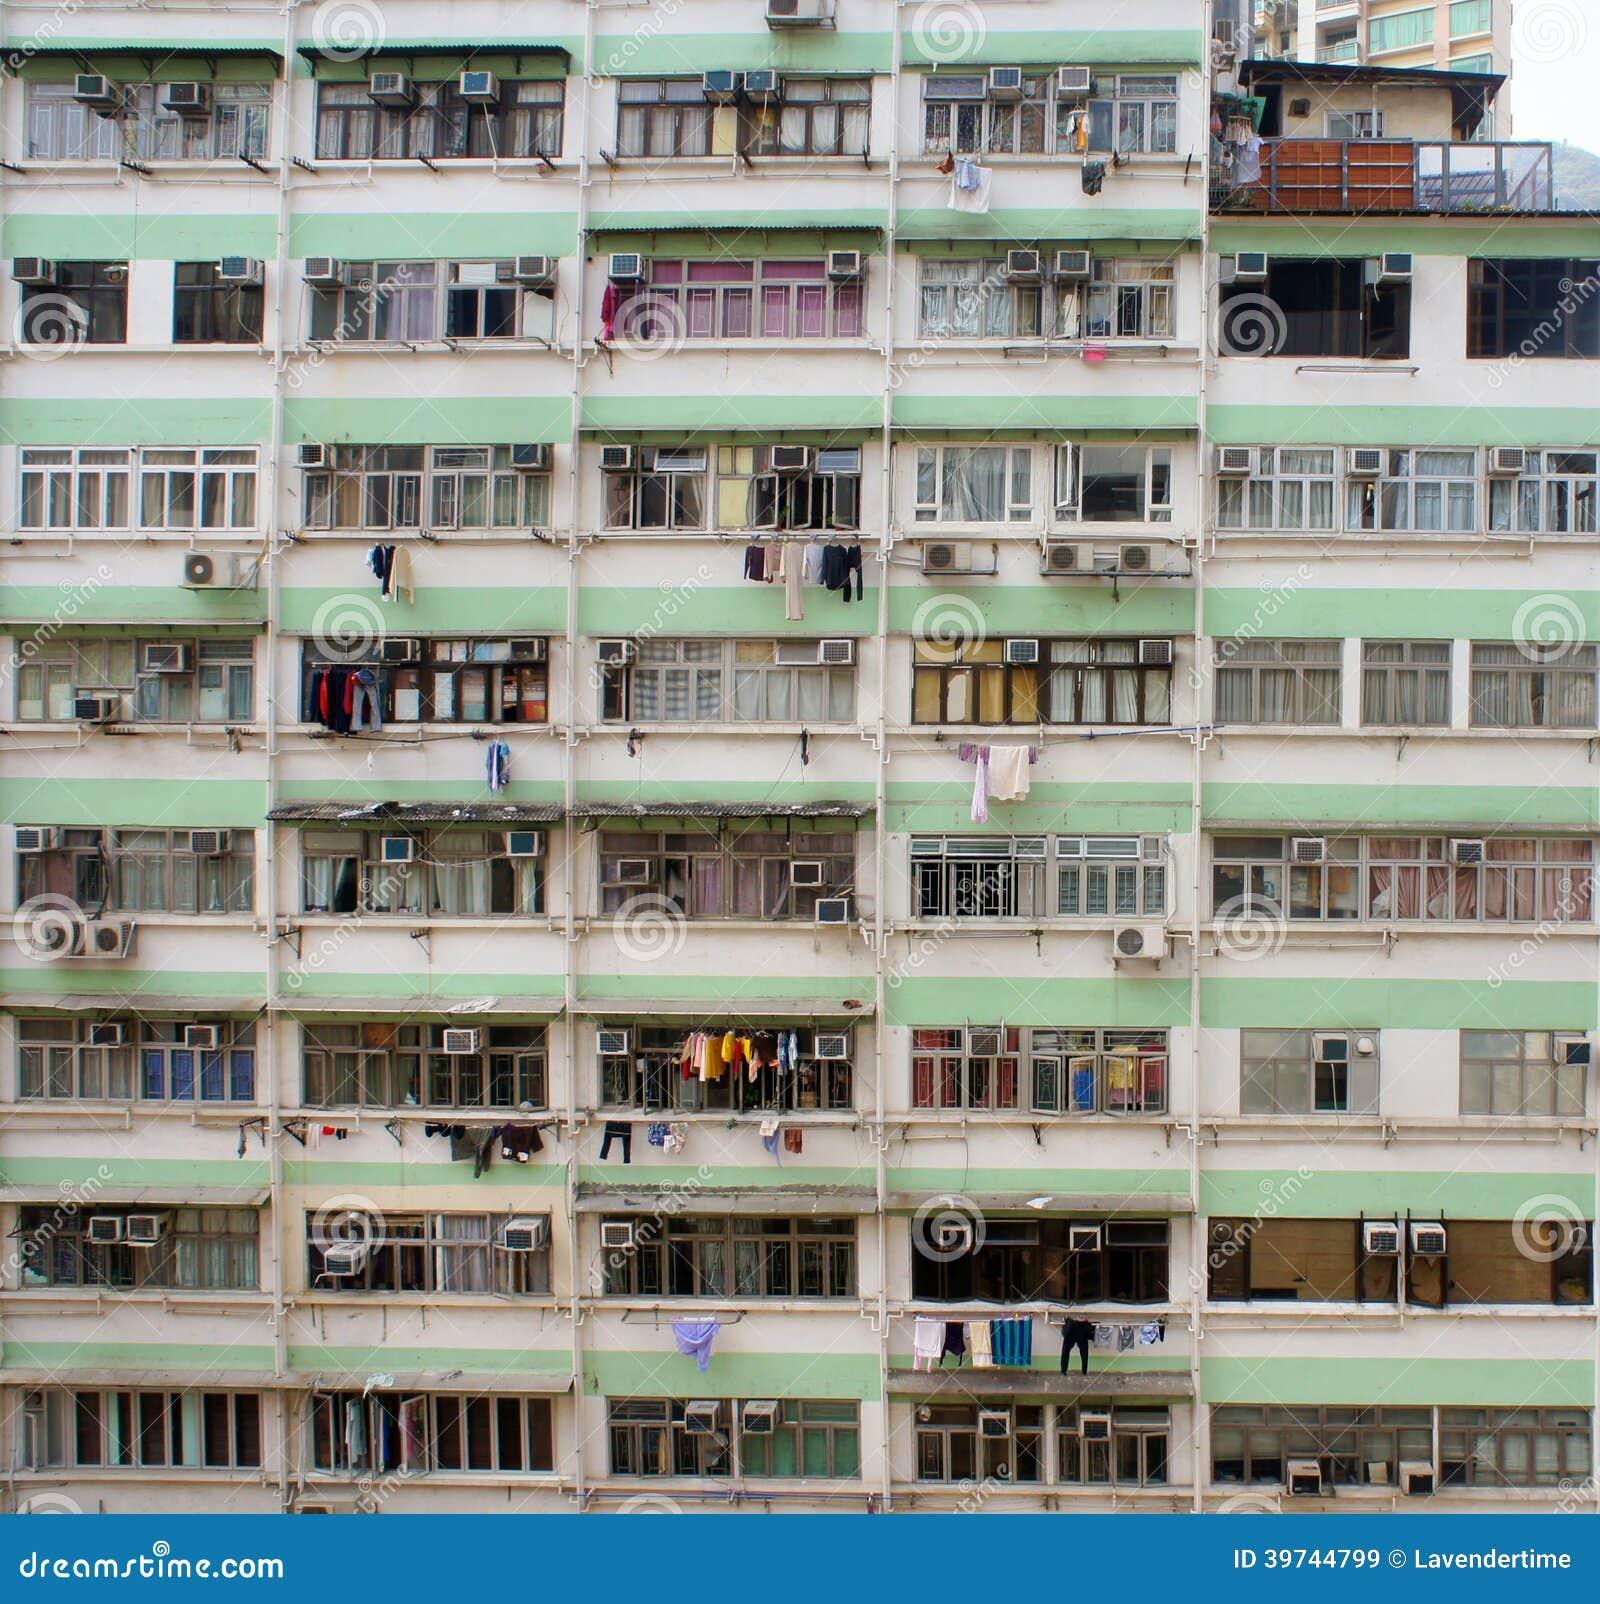 Poor Building Texture Stock Image Image Of Hong Windows 39744799